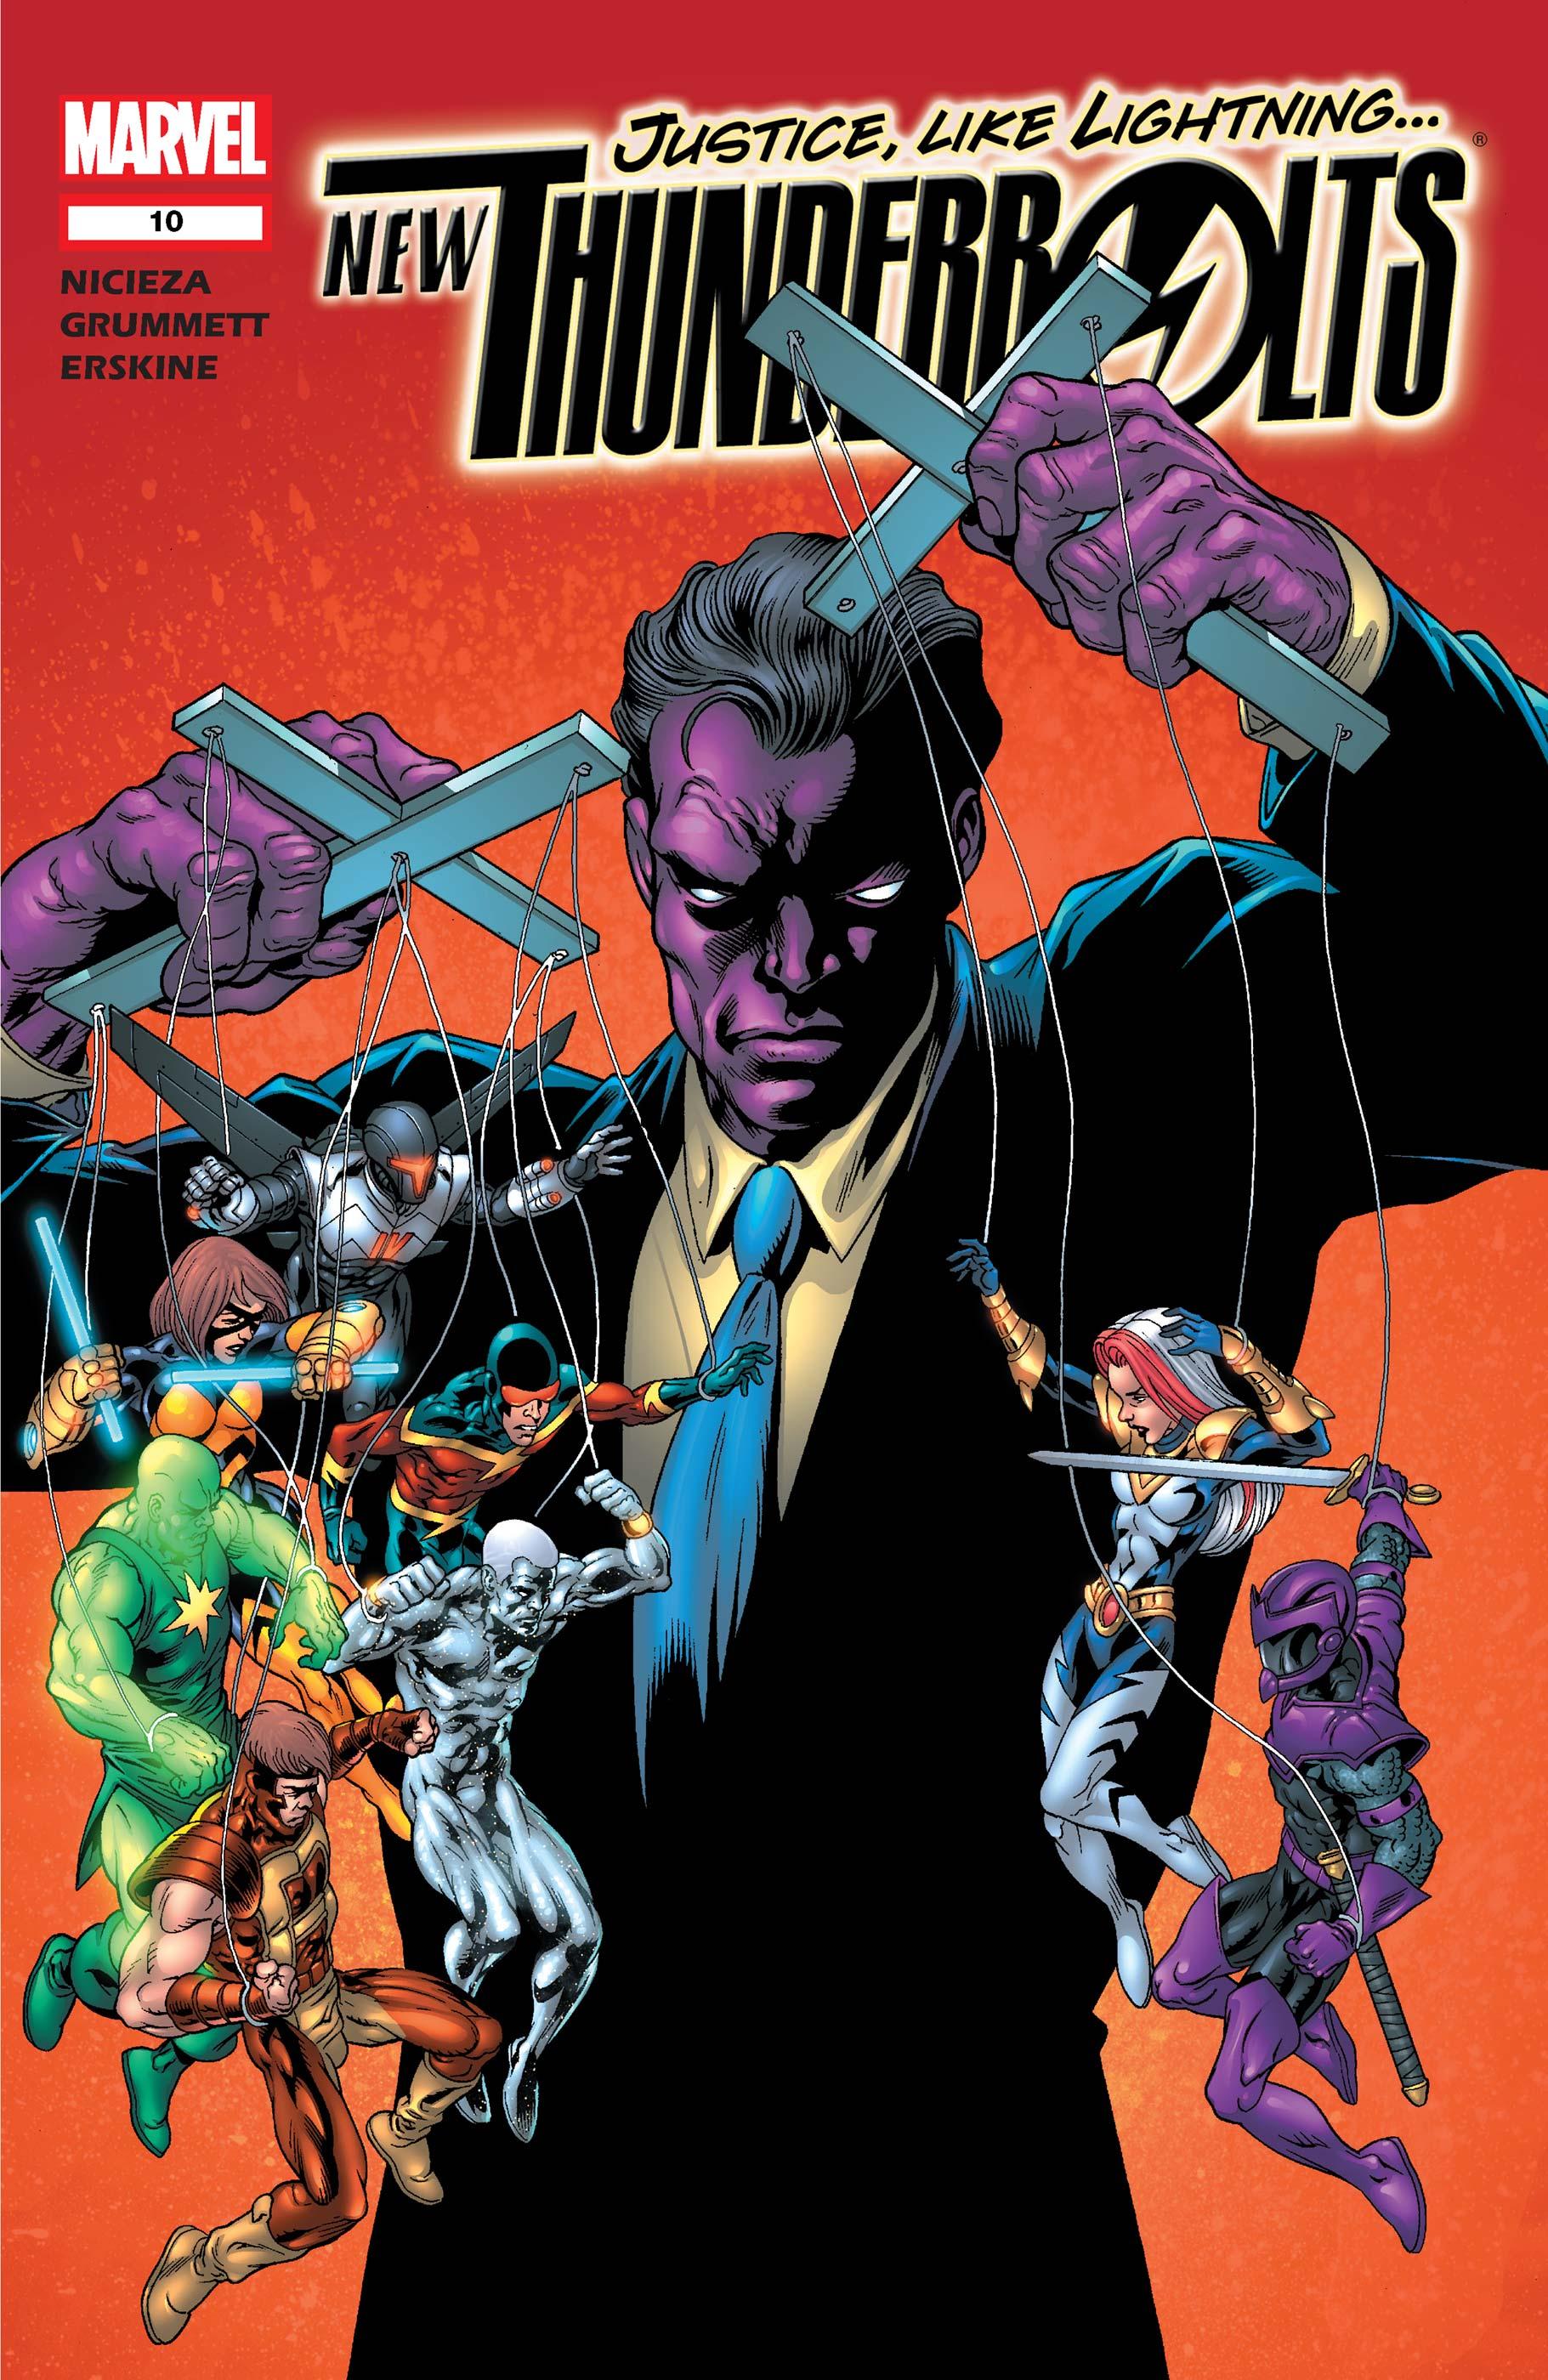 New Thunderbolts (2004) #10